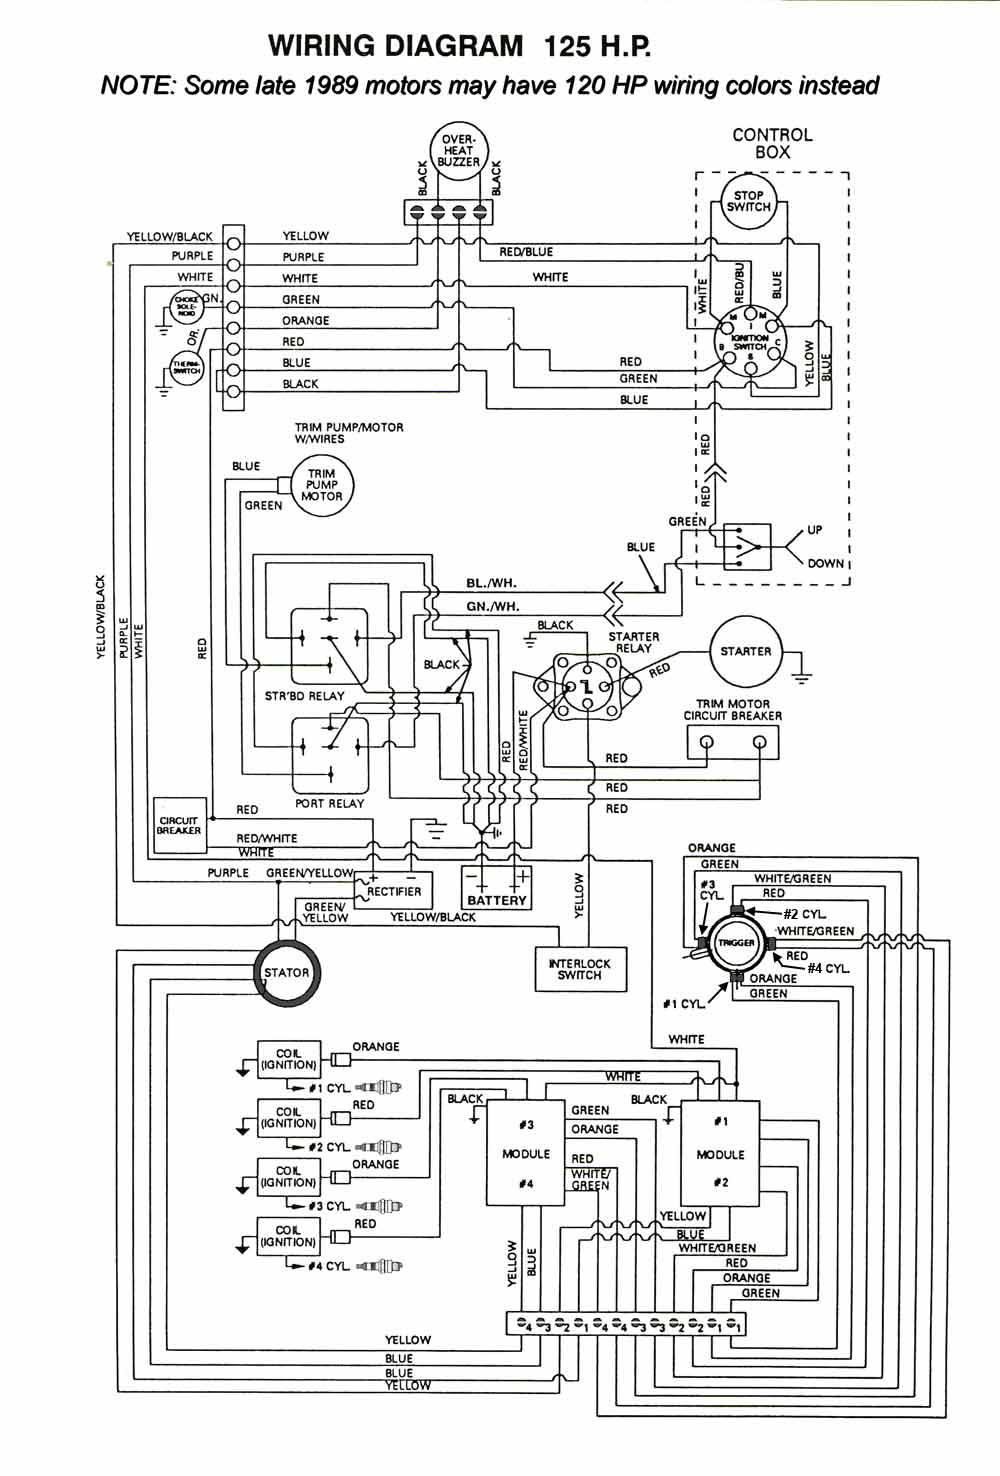 XX_2118] 1987 Bayliner Capri Bowrider Wiring Diagram Download DiagramBenol Stica Nnigh Weasi Emba Mohammedshrine Librar Wiring 101